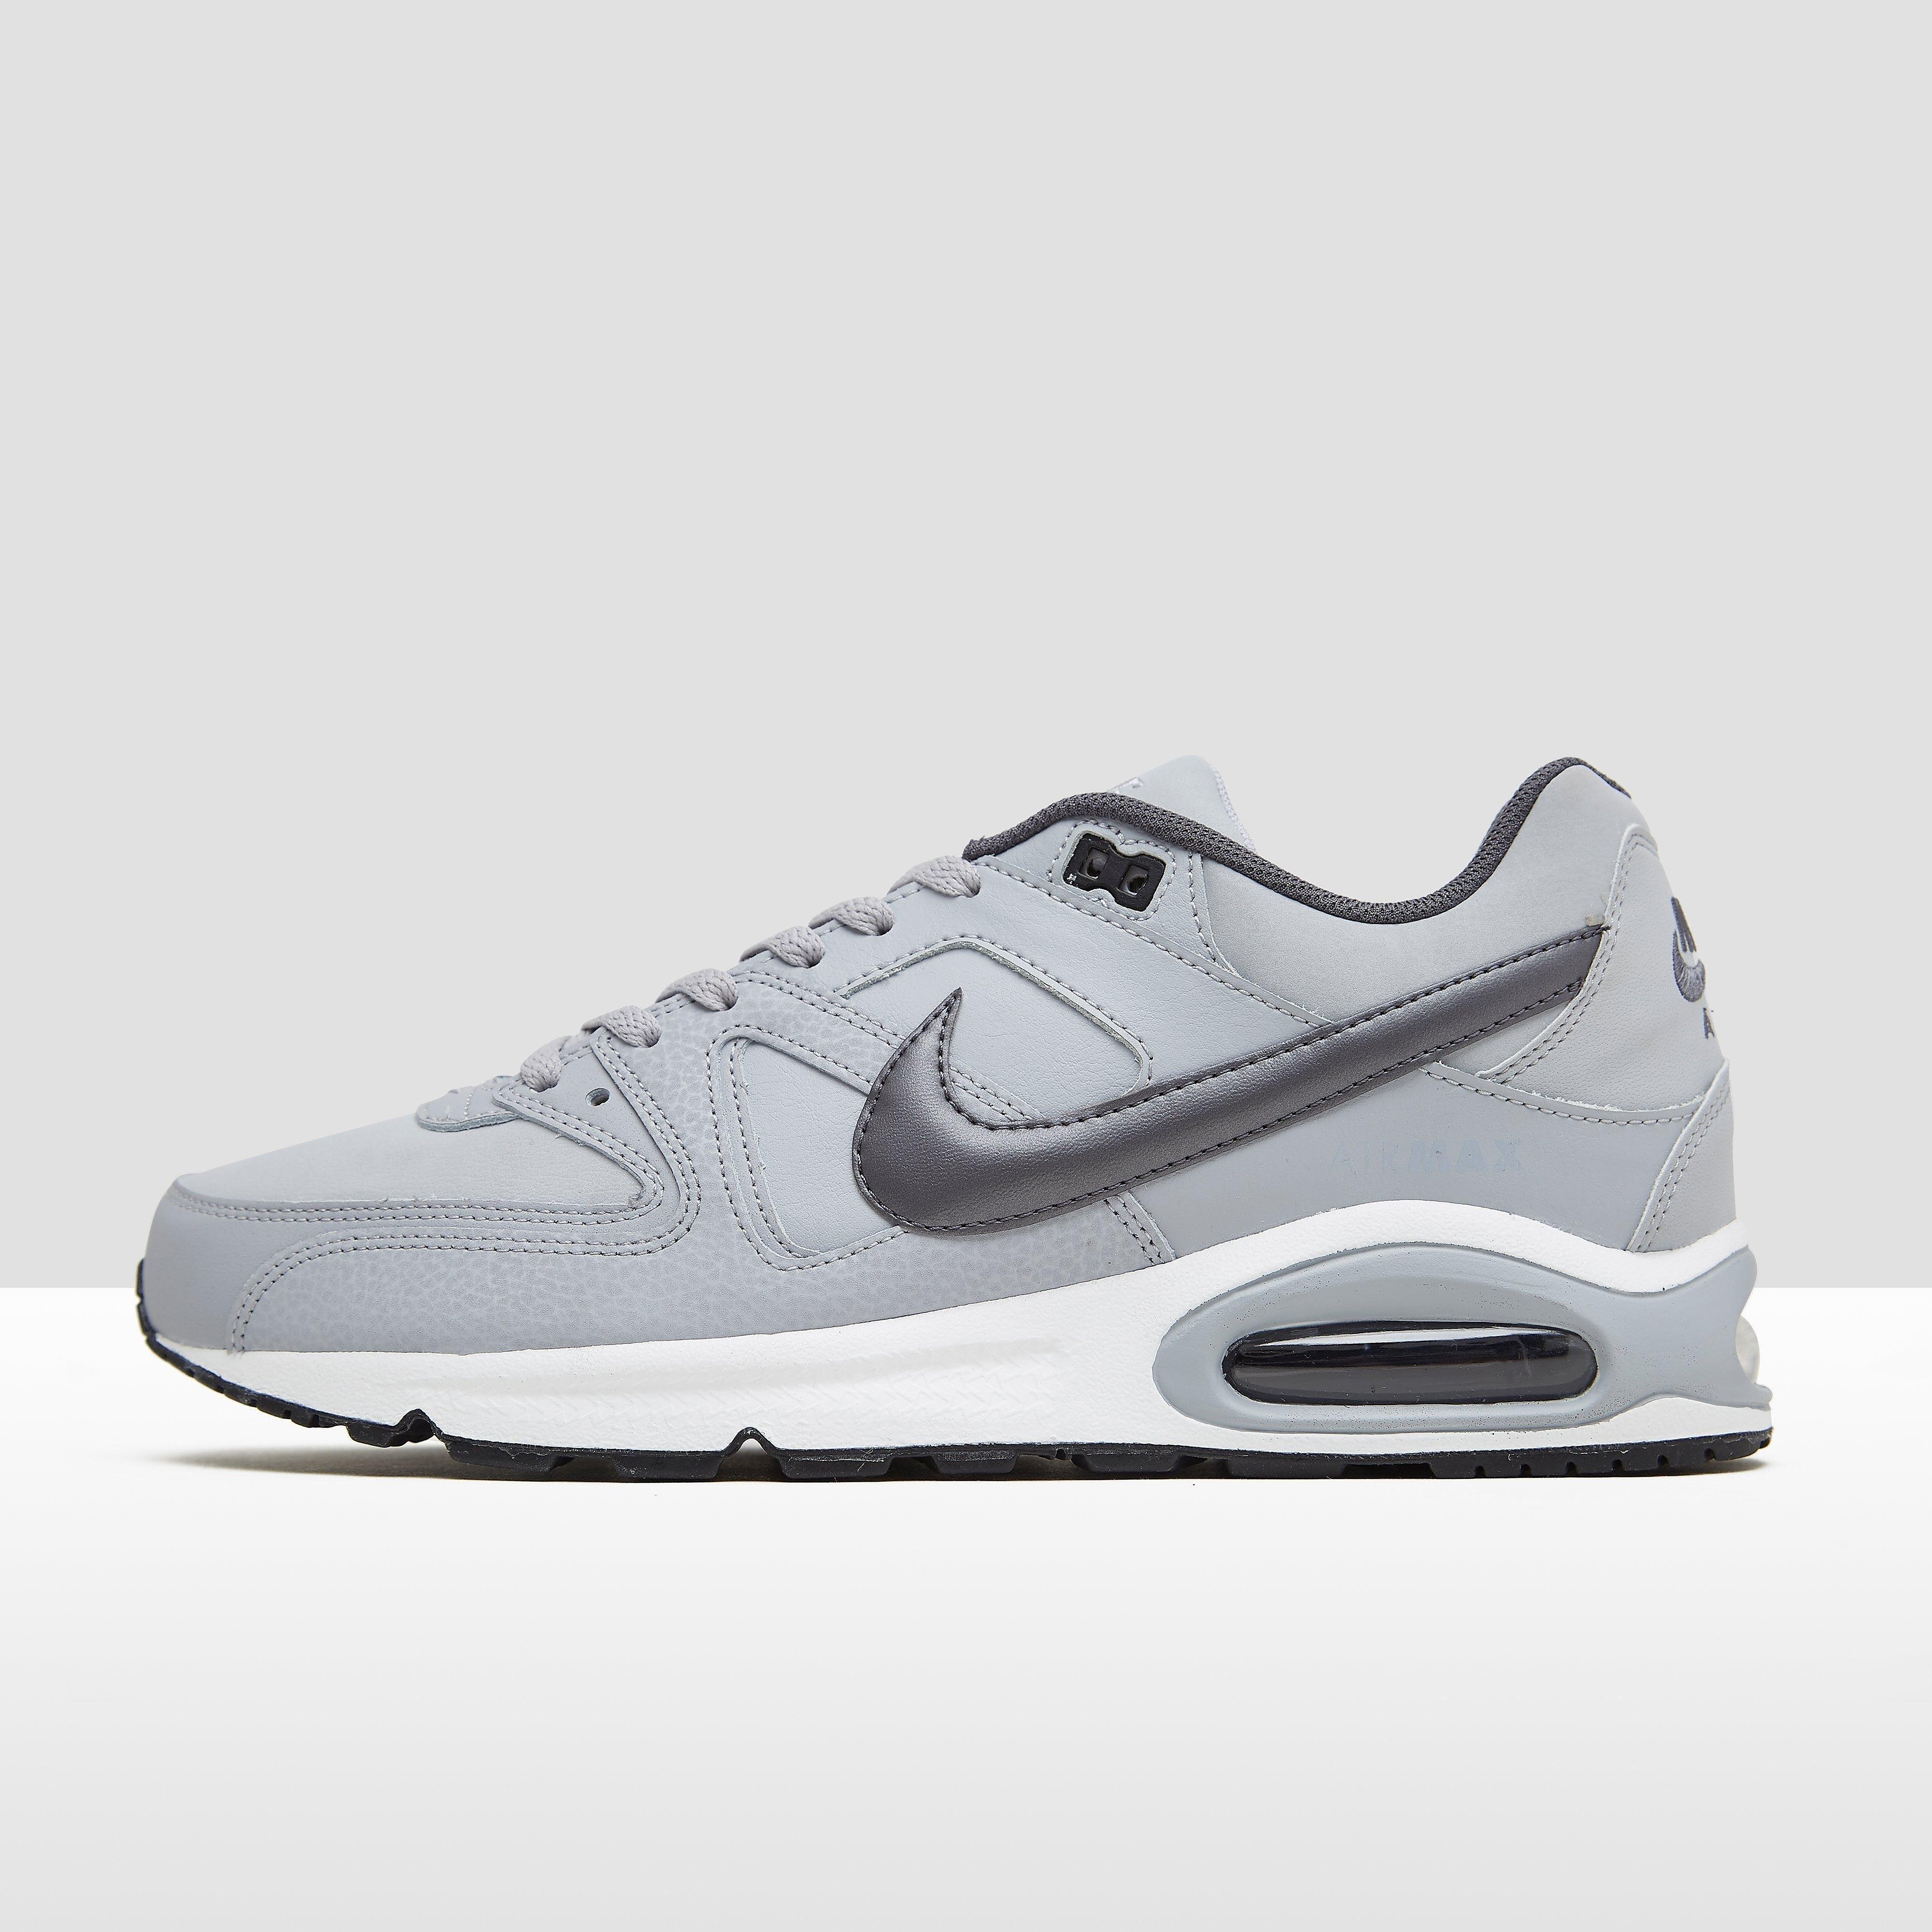 Nike Air Max Command herensneaker zwart en grijs